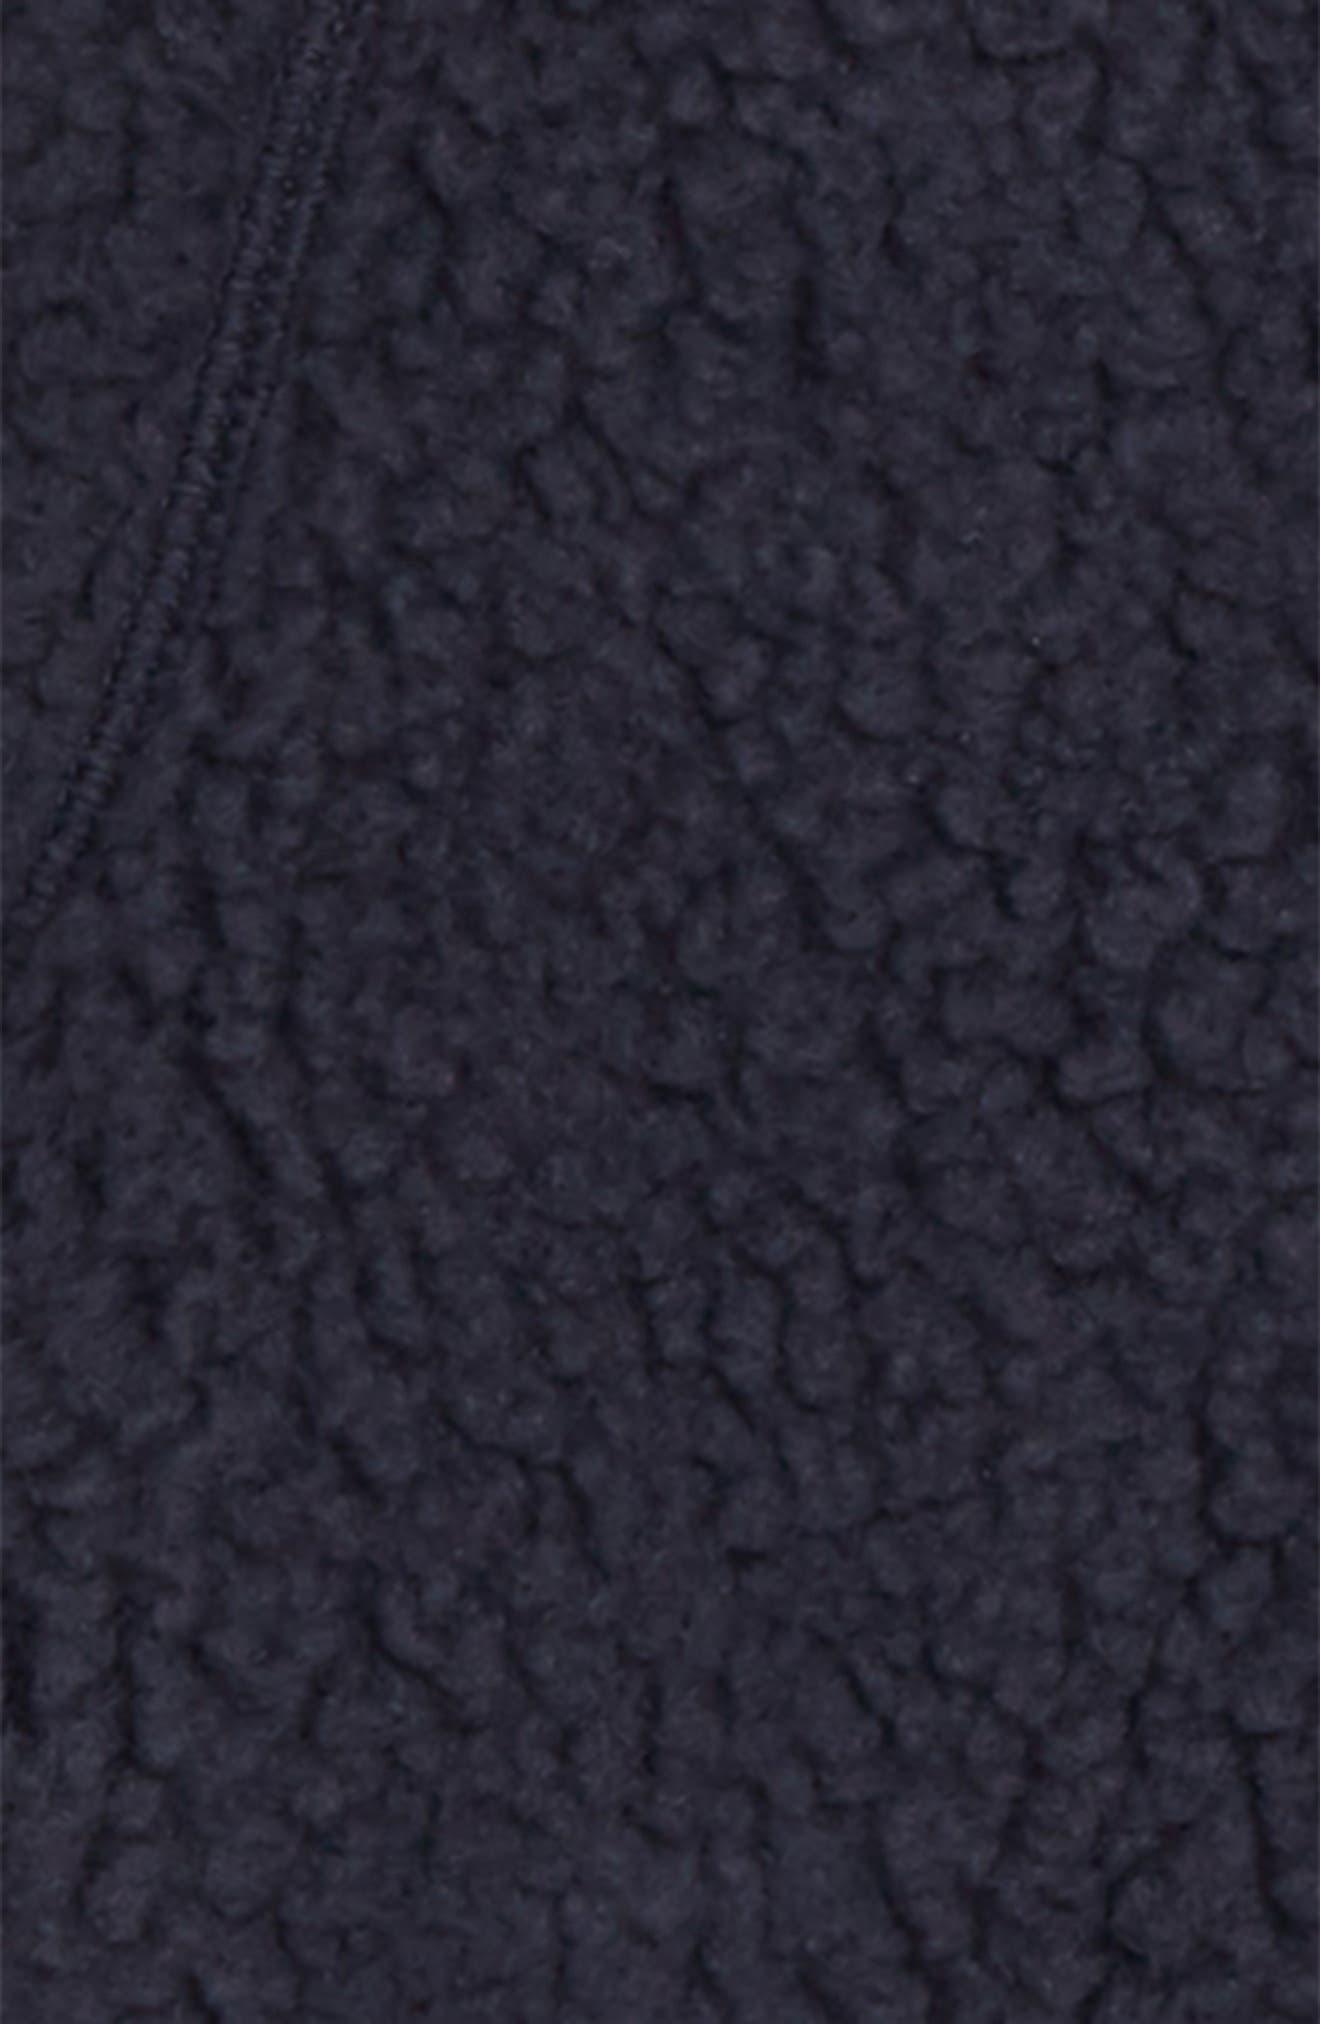 Retro Pile Faux Shearling Jacket,                             Alternate thumbnail 2, color,                             NAVY